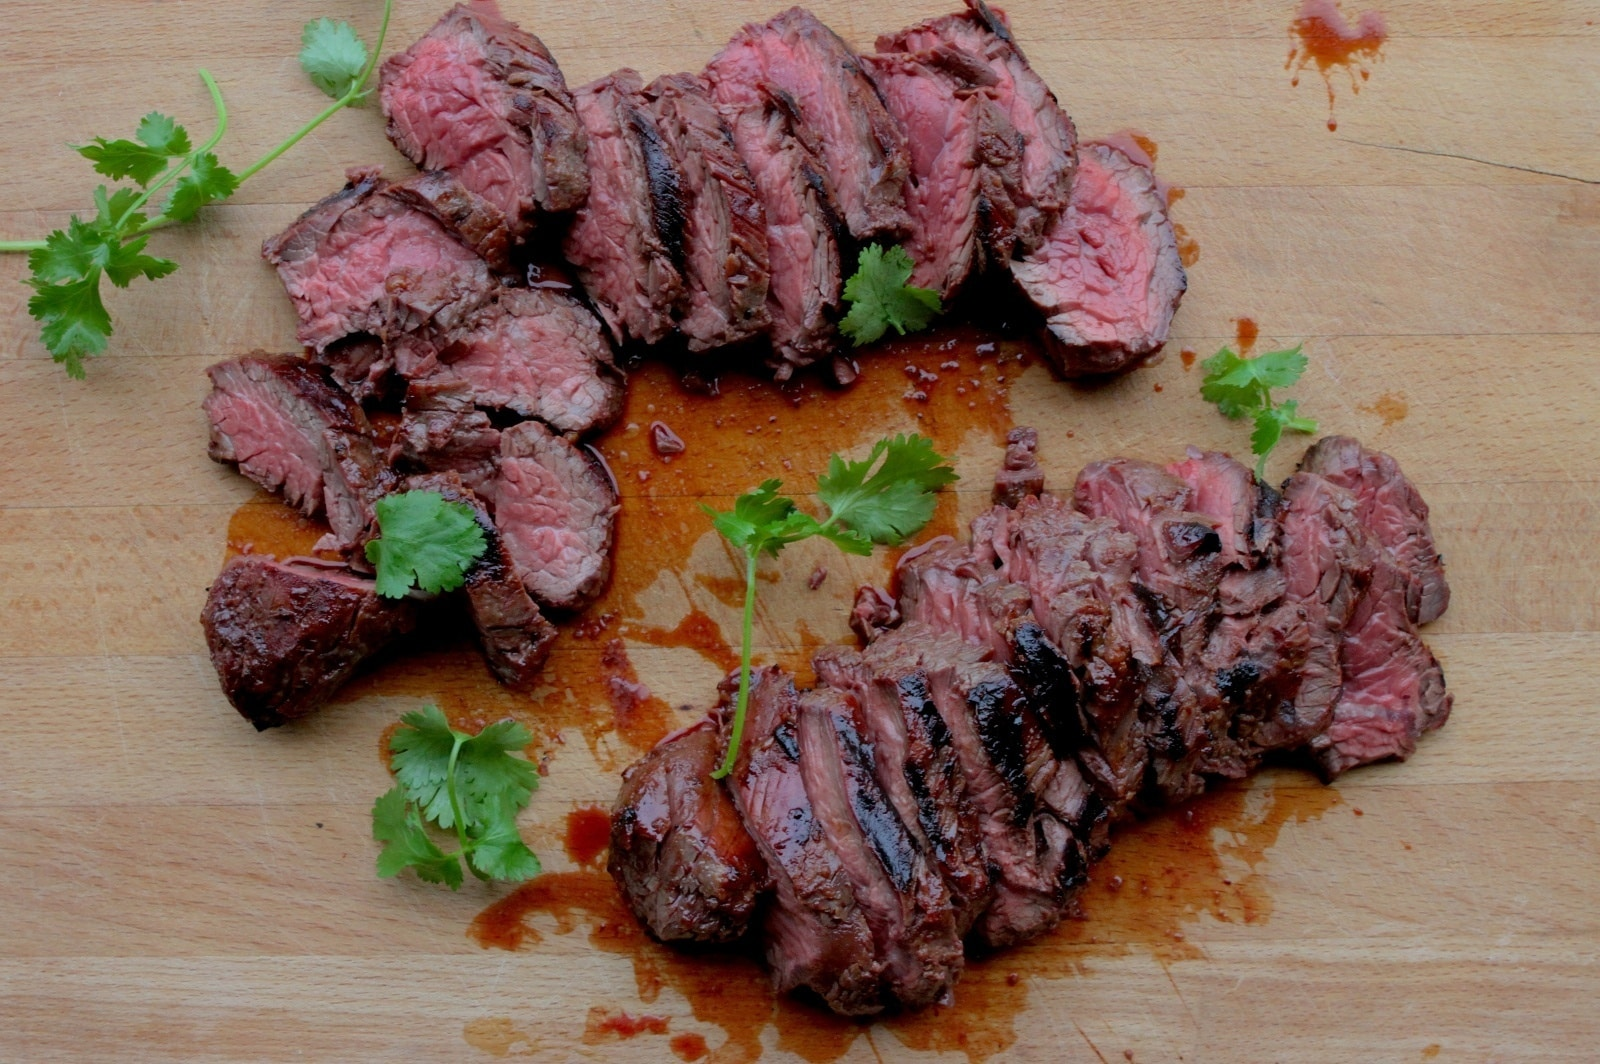 hangar steak e1593307854510